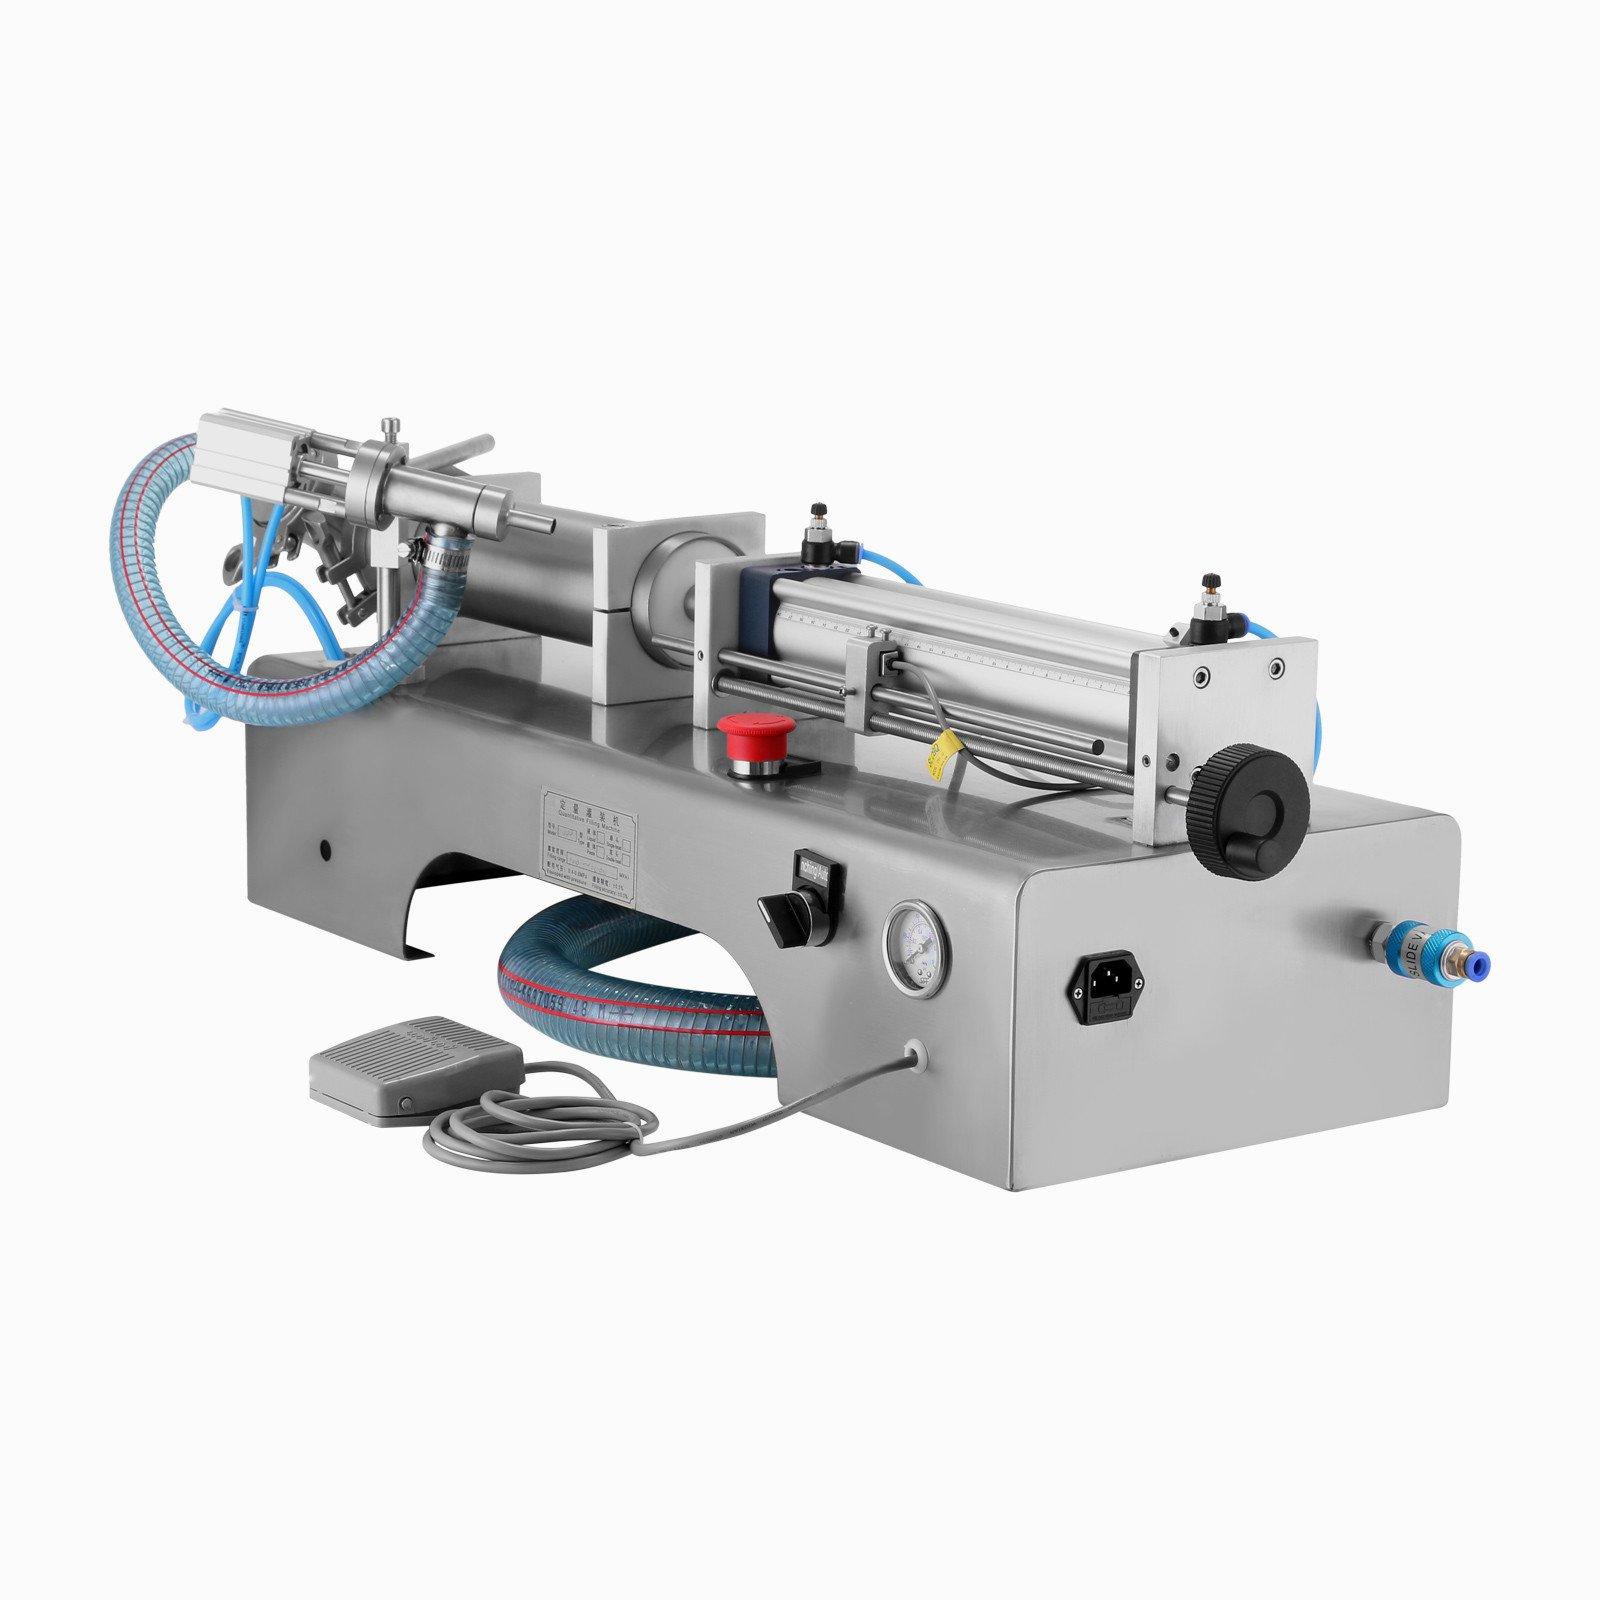 Forkwin Horizontal Full Pneumatic Liquid Filling Machine 100-1000ml Liquid Filling Machine Semi Automatic 5-20bottles/min Liquid Filling Machine for High Viscosity Fluid